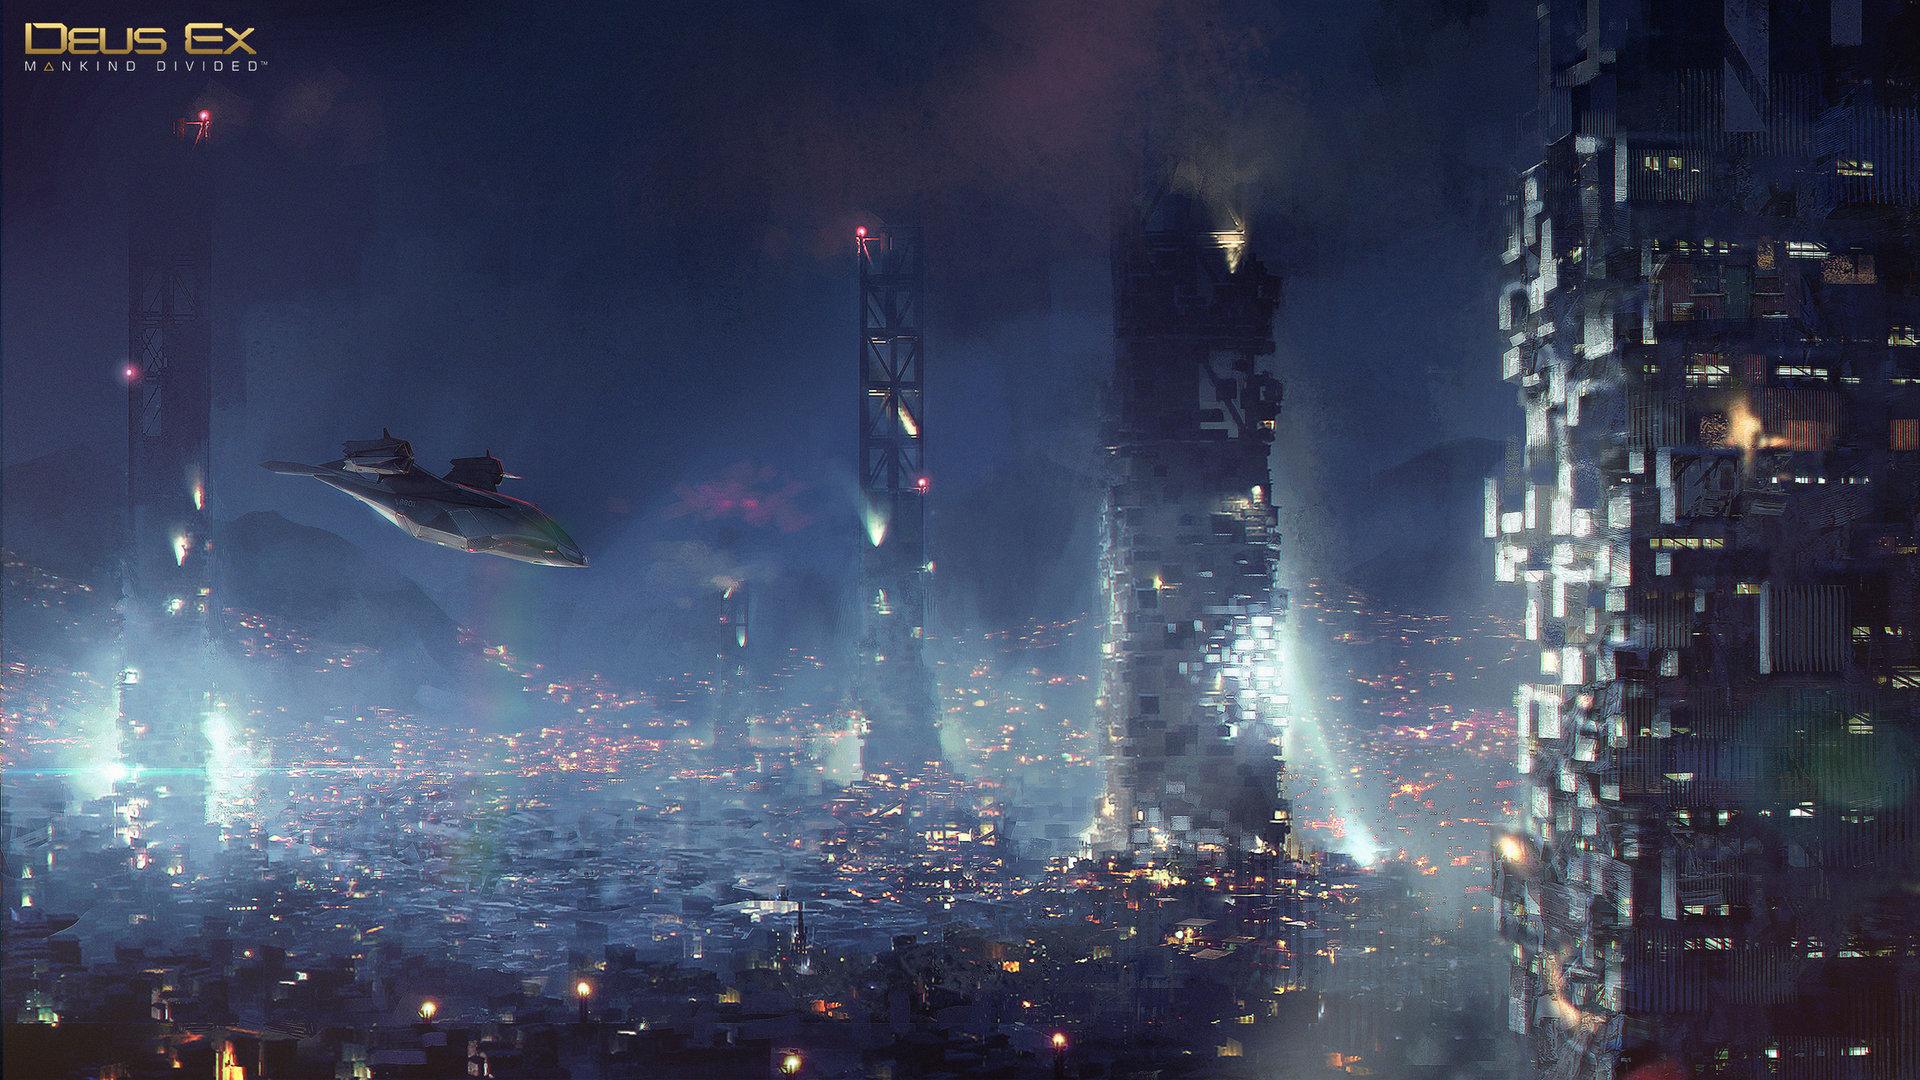 Deus Ex: Mankind Divided концепт арт корабля и города moodshot